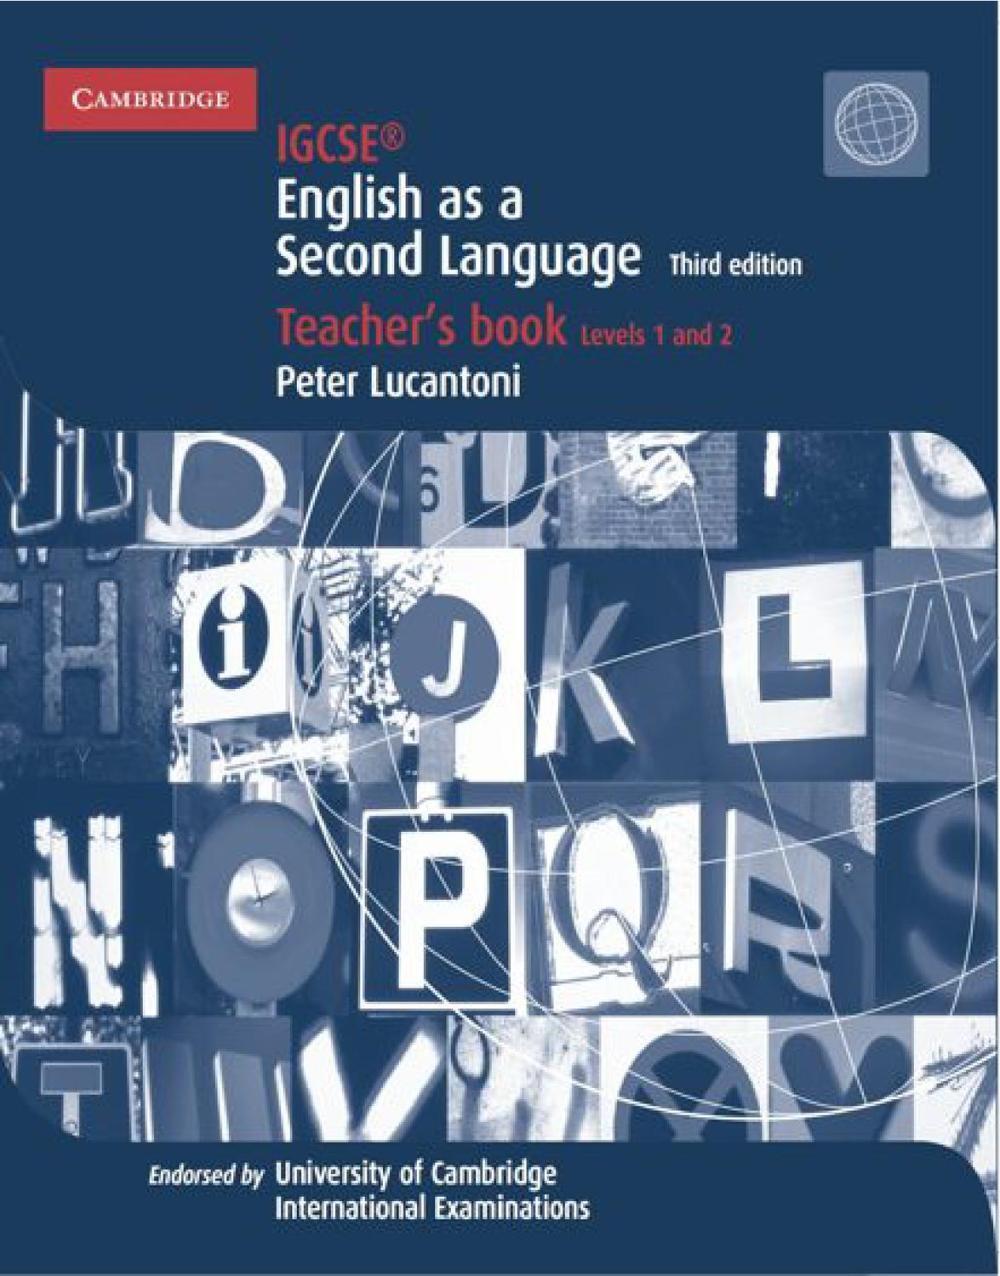 medium resolution of Cambridge IGCSE English as a Second Language: Teacher's Book (third  edition) by Cambridge University Press Education - issuu